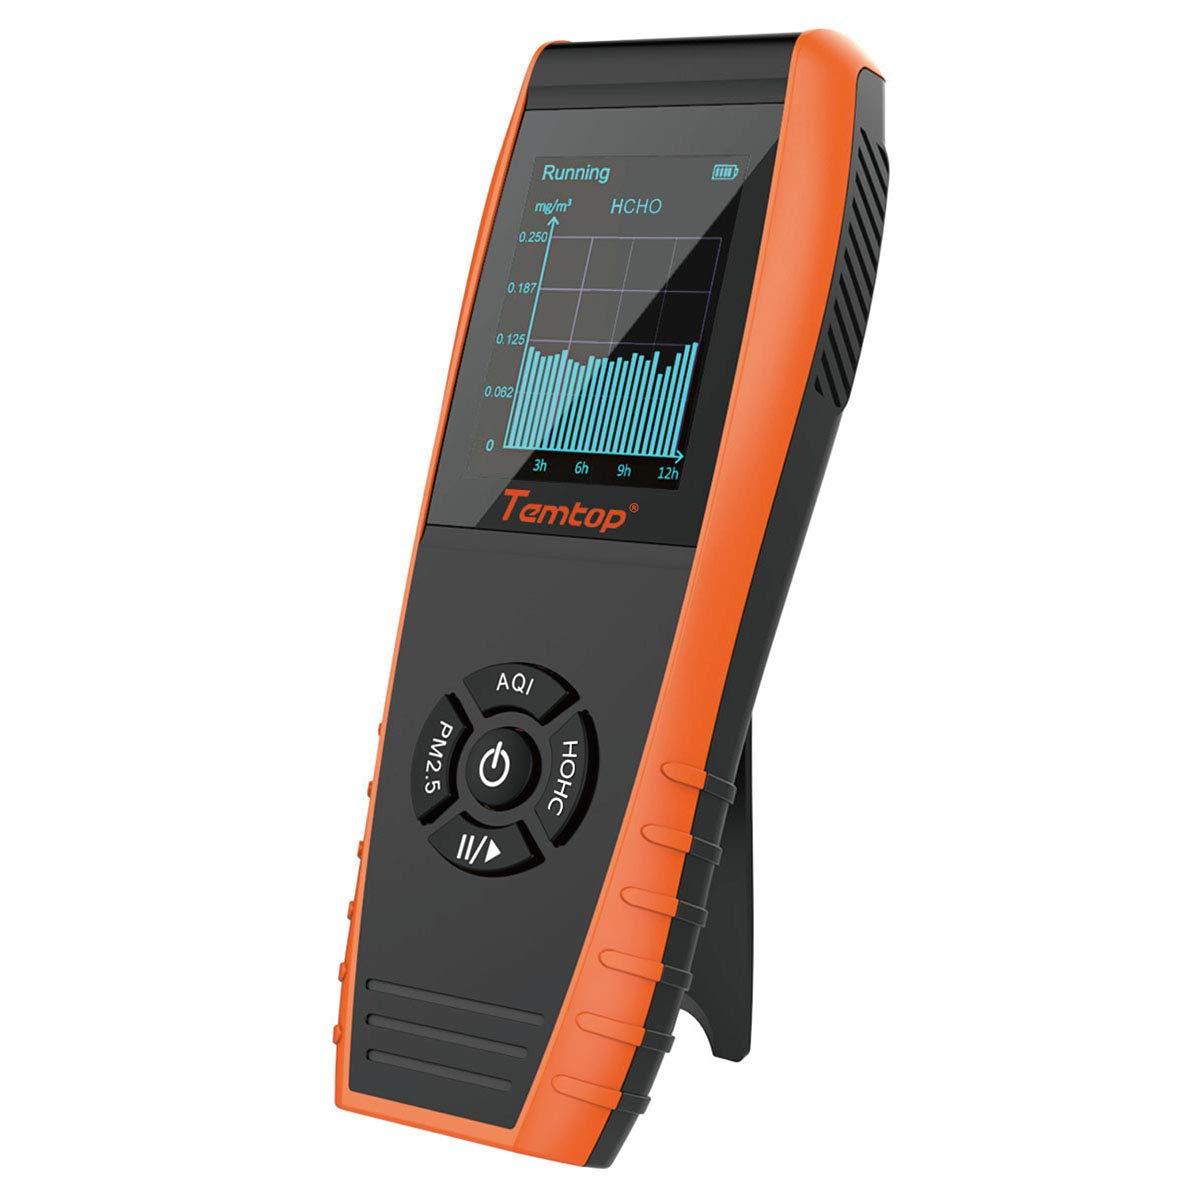 Temtop LKC-1000S+ [Alternative dealer] Air Ranking TOP10 Quality Formaldehyde Detector Monitor